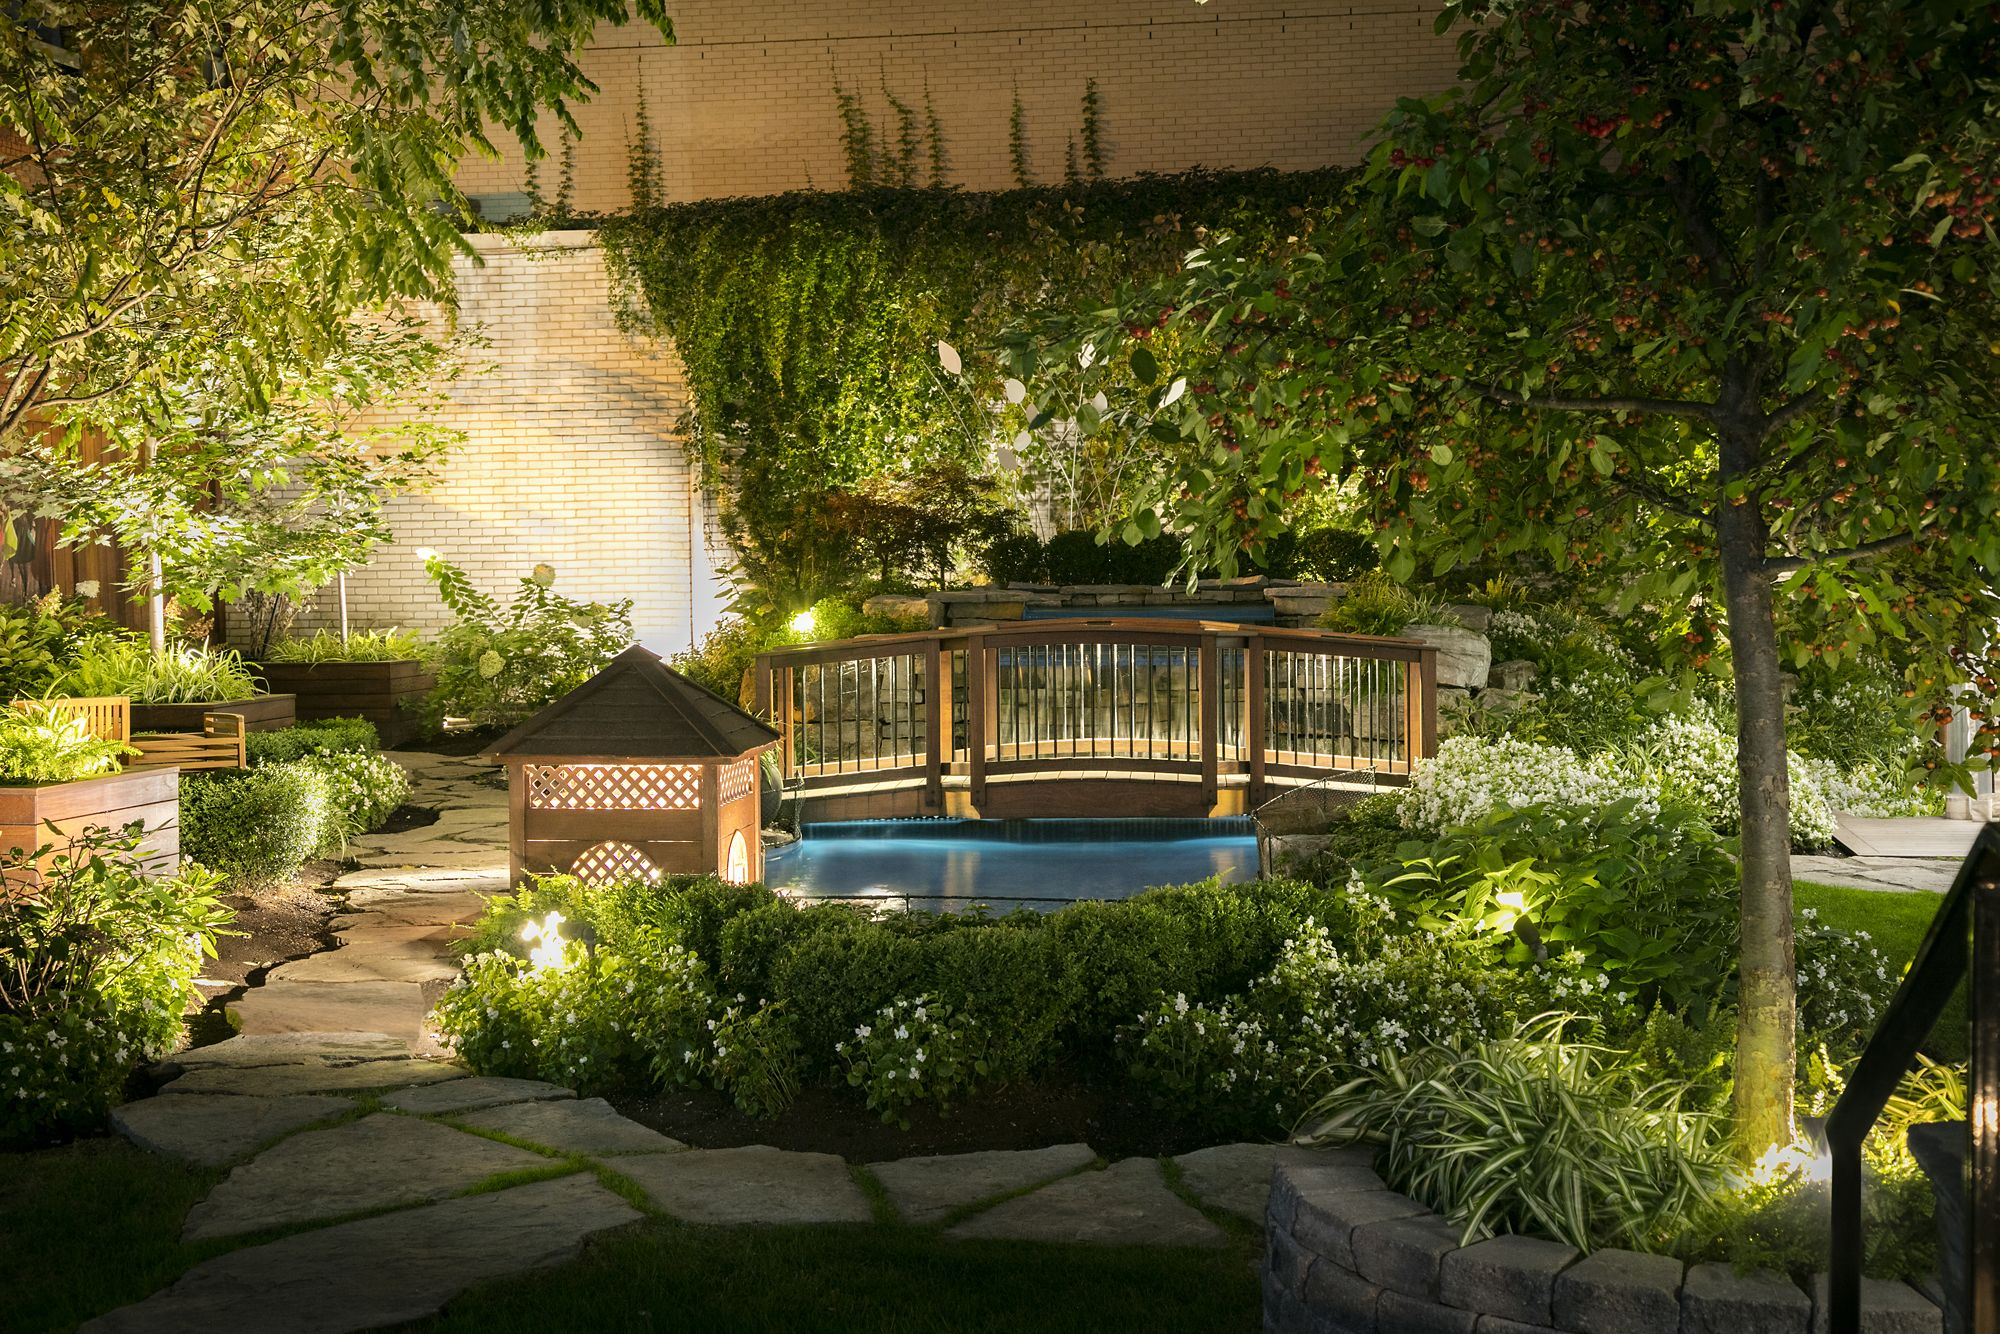 Ritz_Montreal Garden 19.jpeg